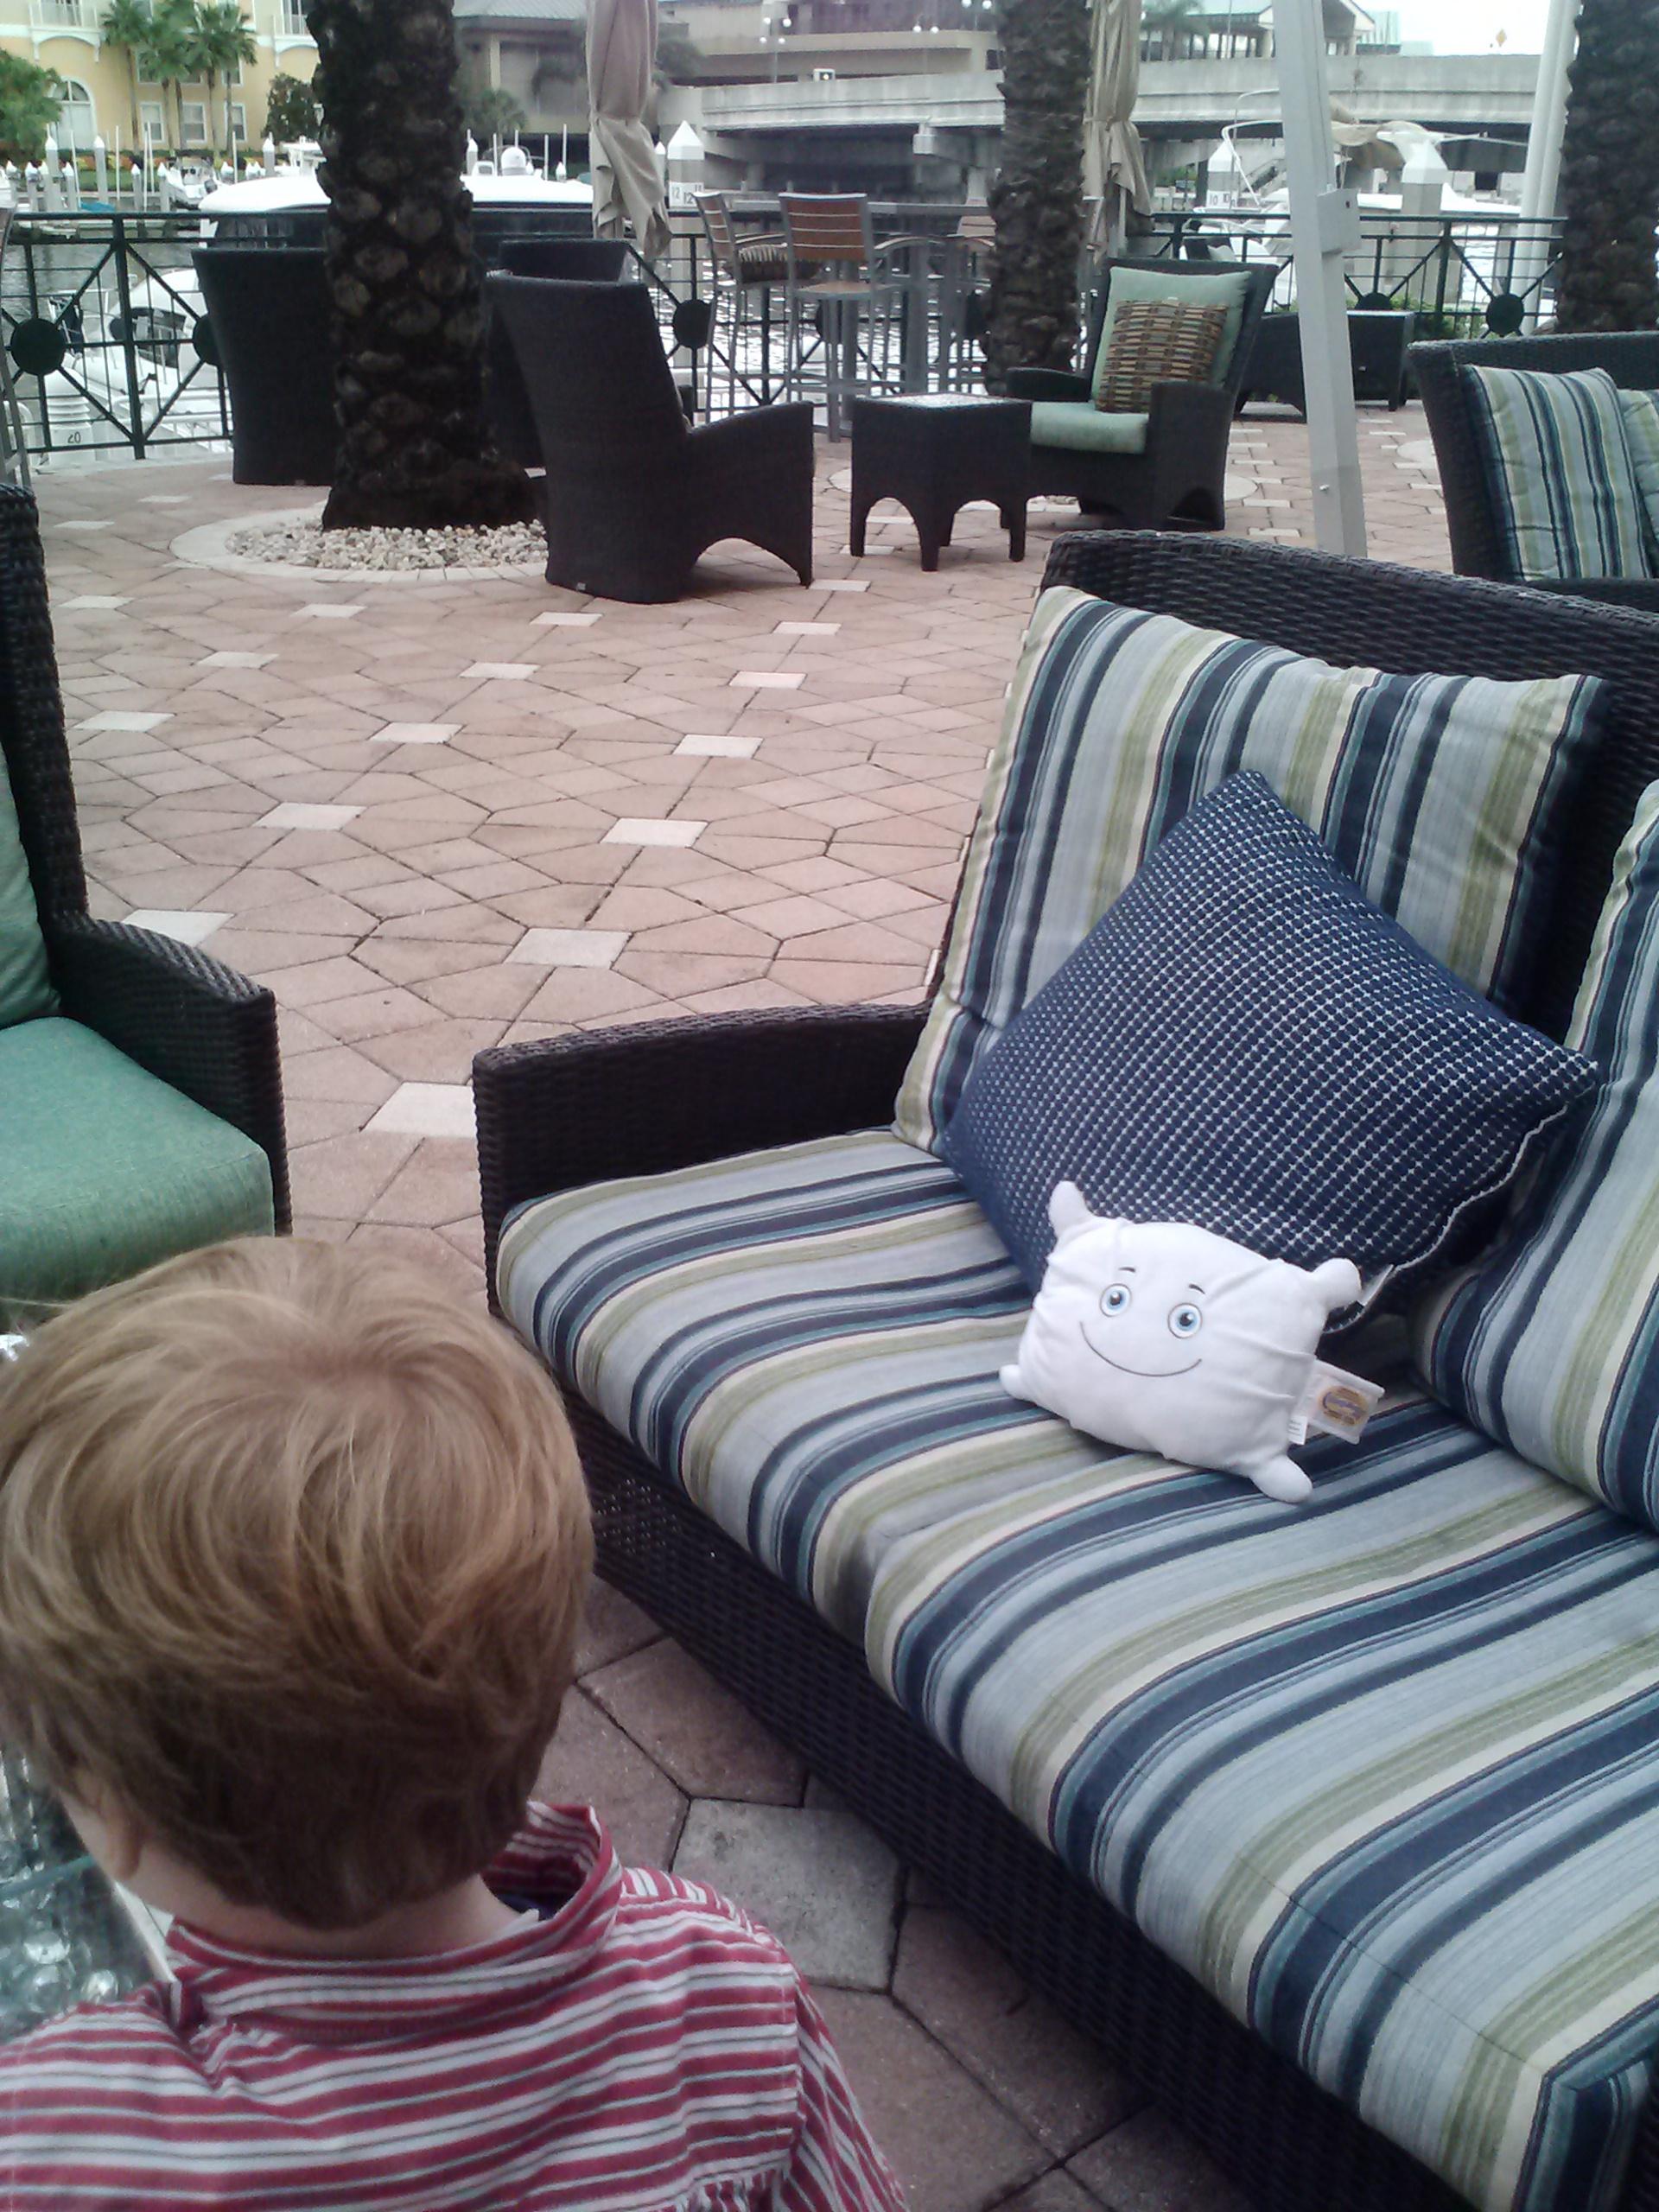 McStuffy likes the patio at grandma and grandpa's hotel.